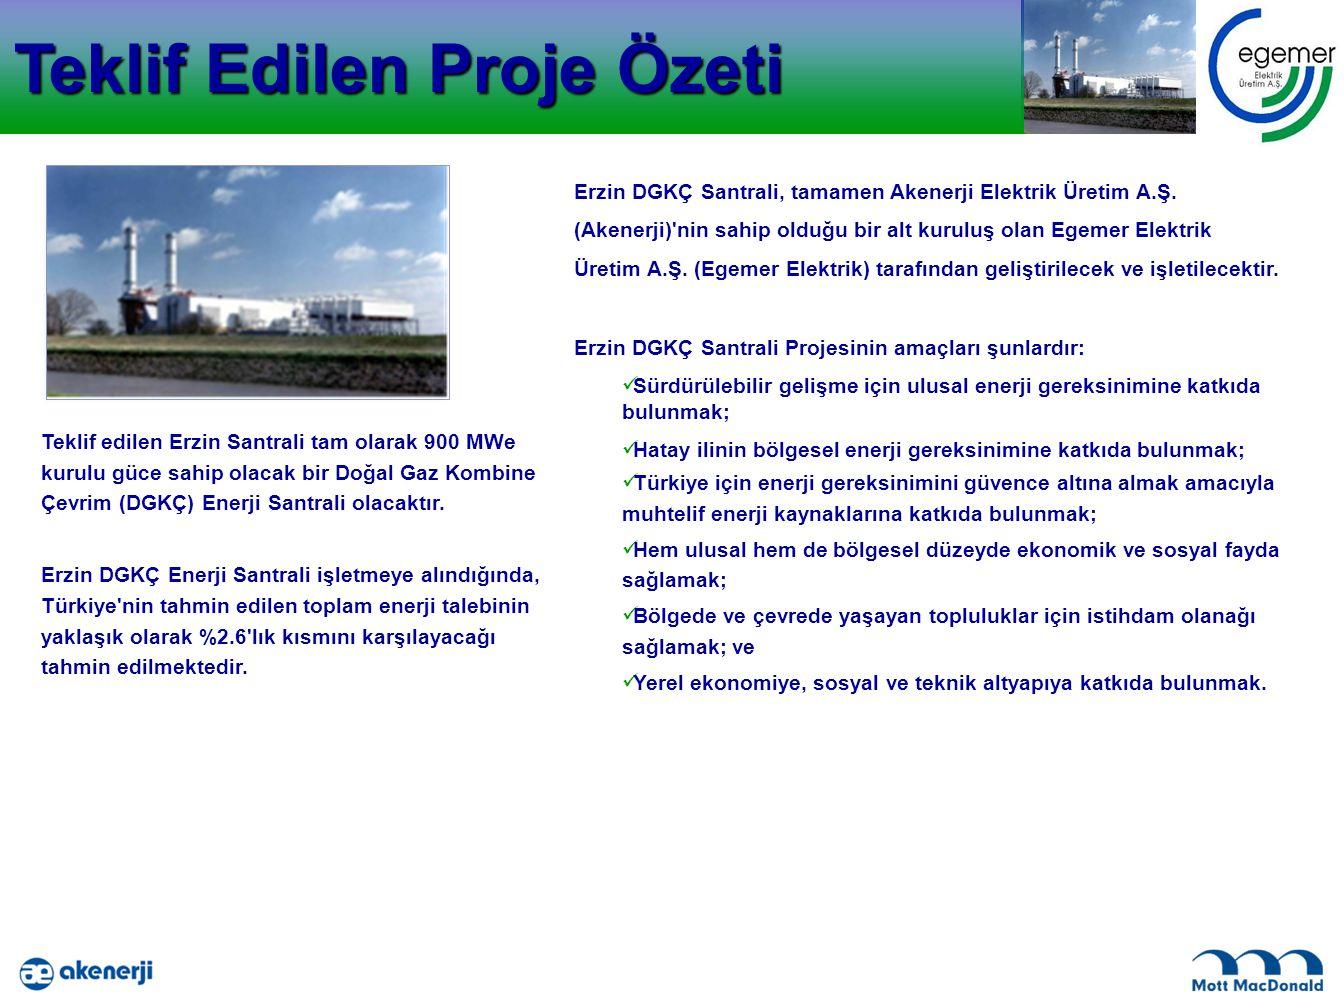 Egemer Elektrik kimdir. Egemer Elektrik Üretim A.Ş.